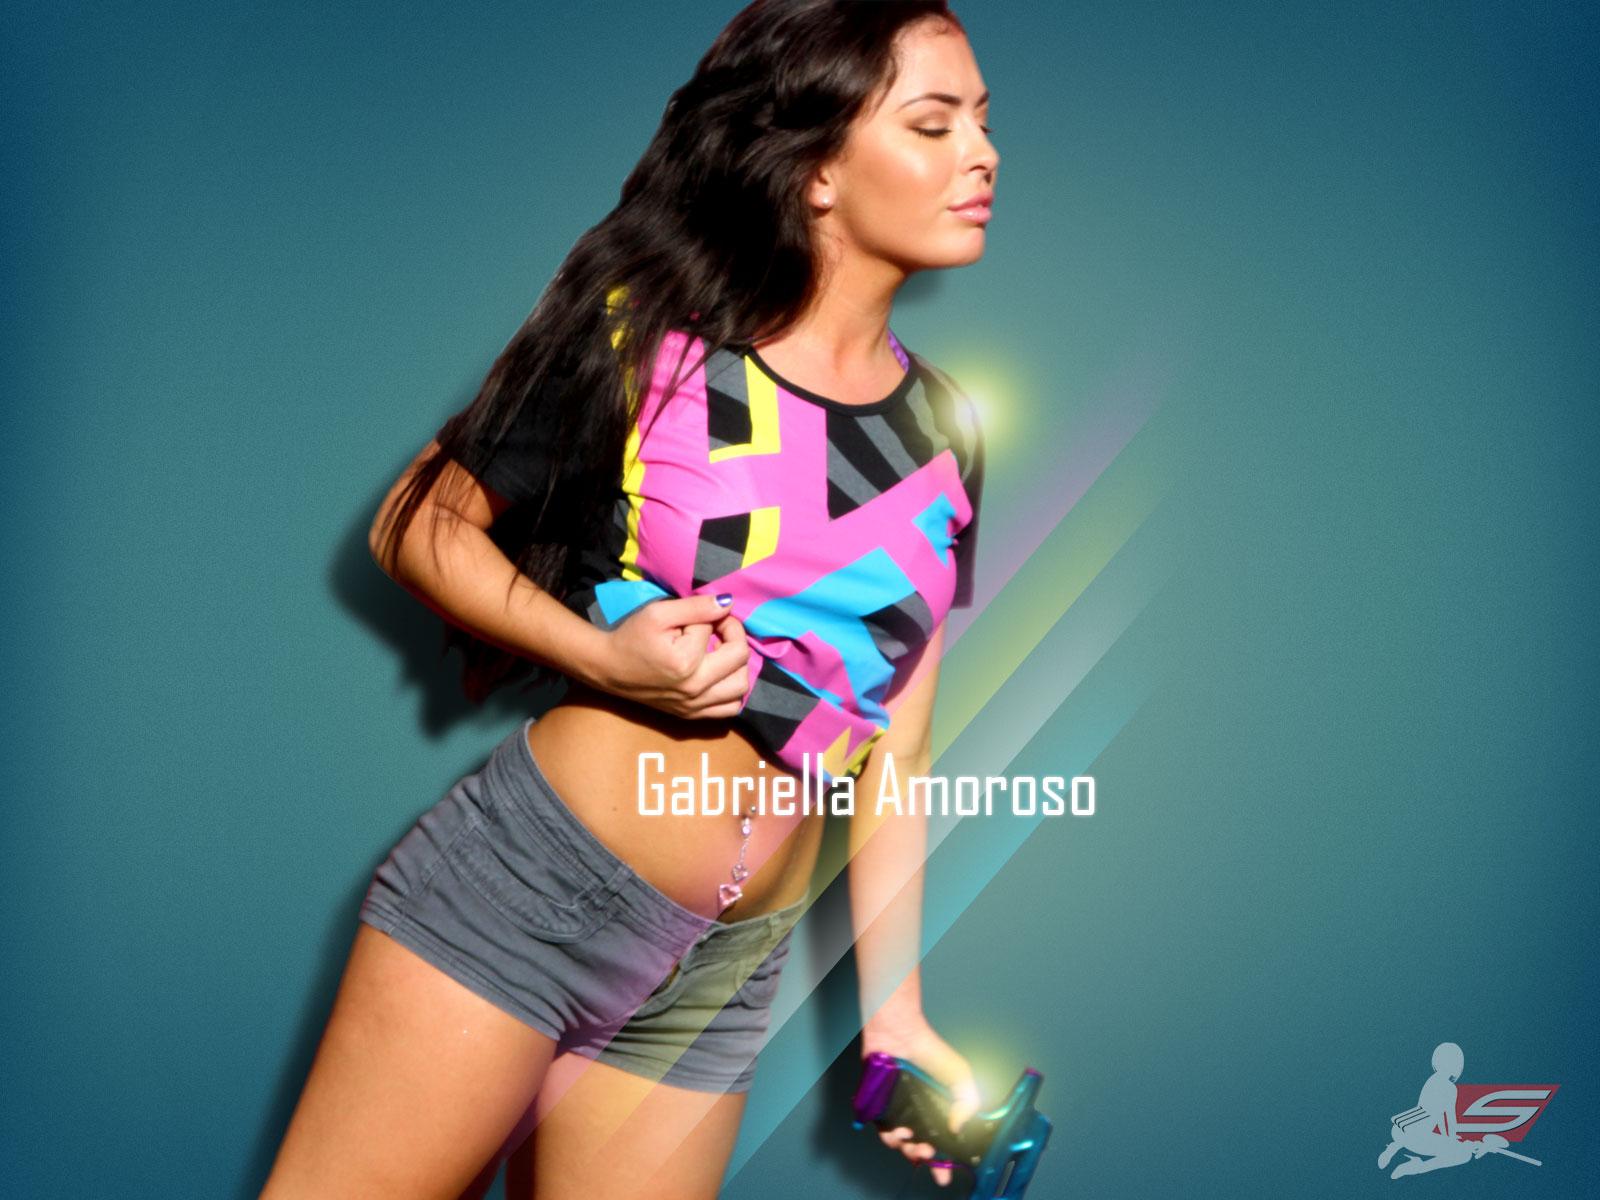 Miss September 2011 – Gabriella Amoroso